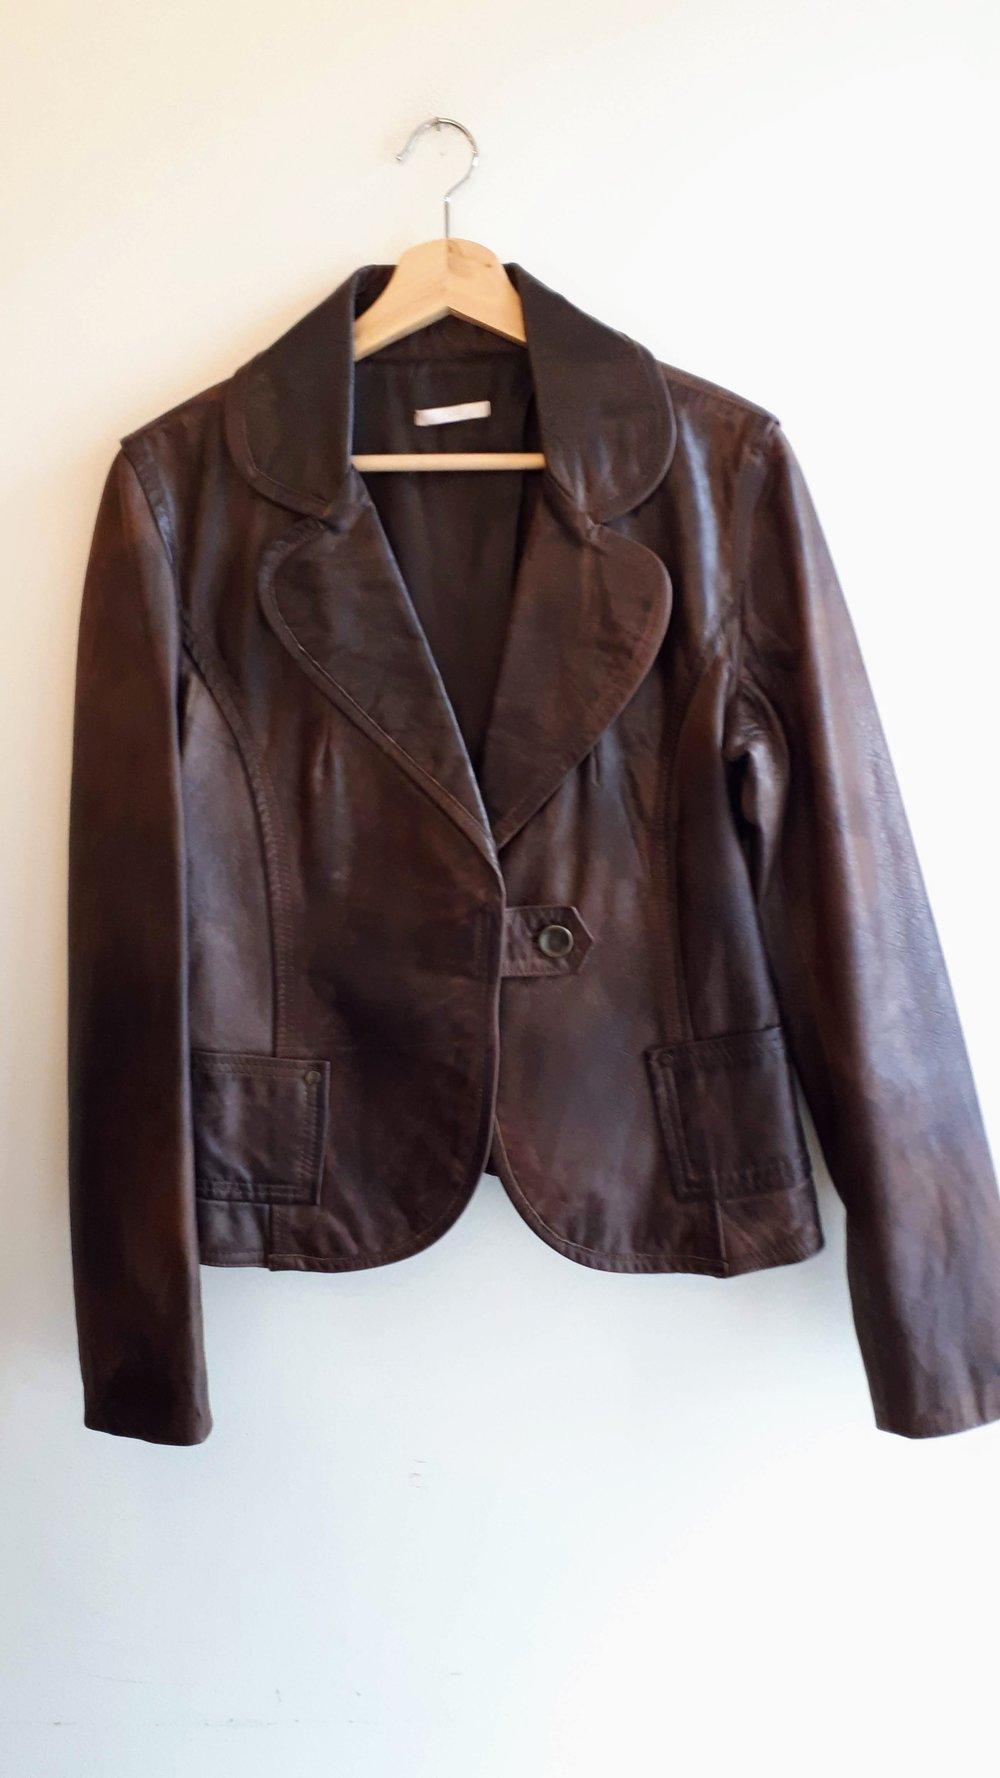 Pois coat; Size S, $62